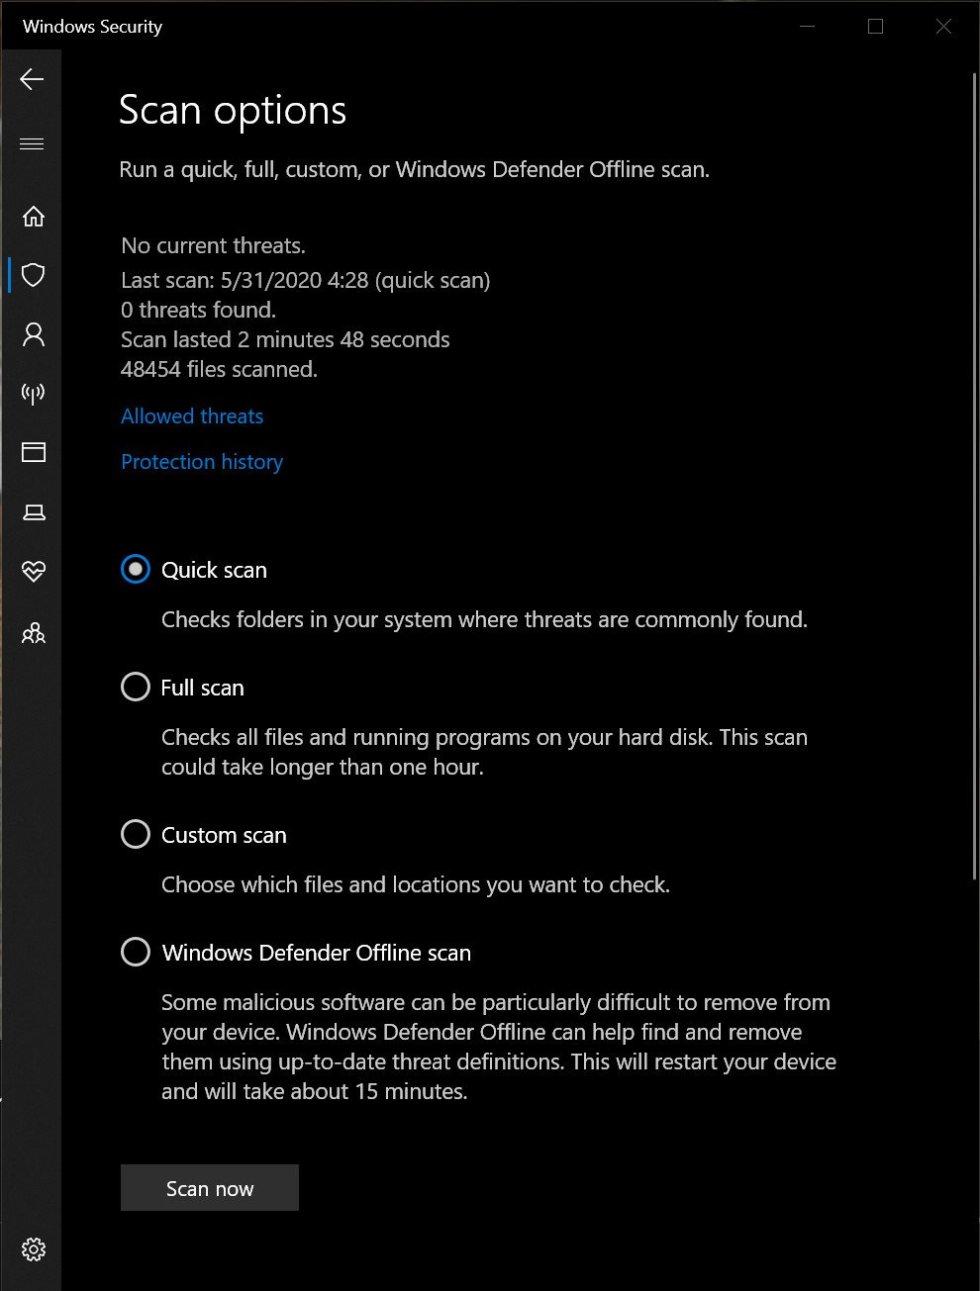 Windows Defender Scan Options Screenshot